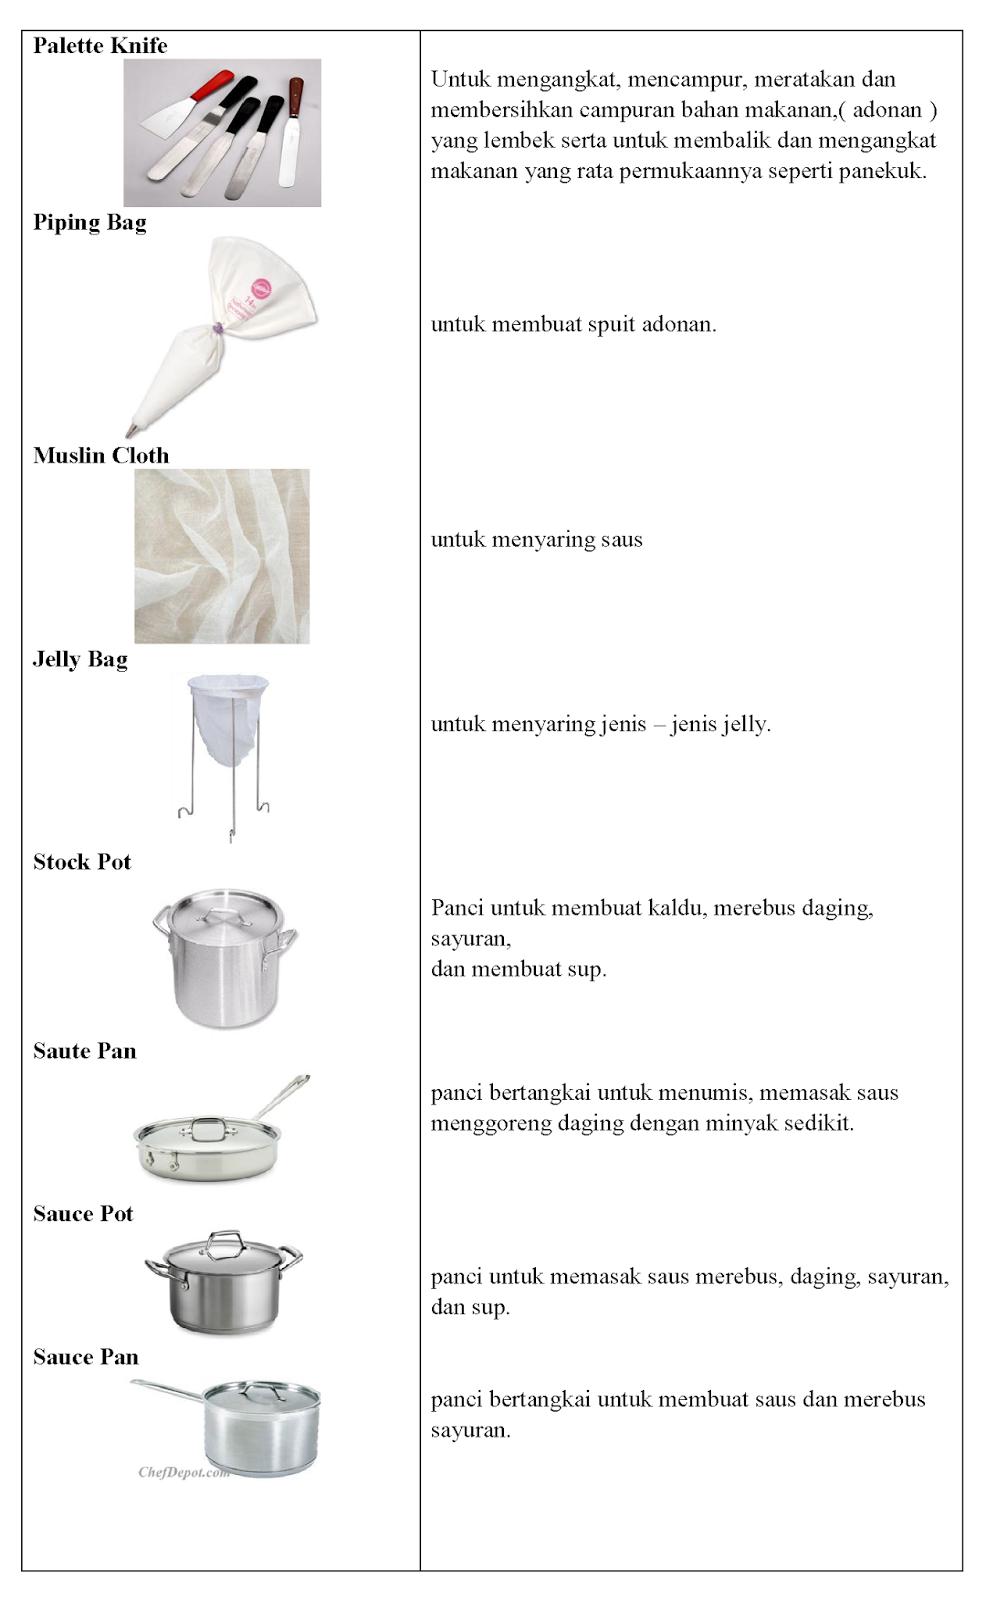 Macam Macam Peralatan Dapur Beserta Fungsinya : macam, peralatan, dapur, beserta, fungsinya, Jenis, Peralatan,, Fungsi, Pengolahan, Makanan, MEMBUAT, TUGAS, SEKOLAH